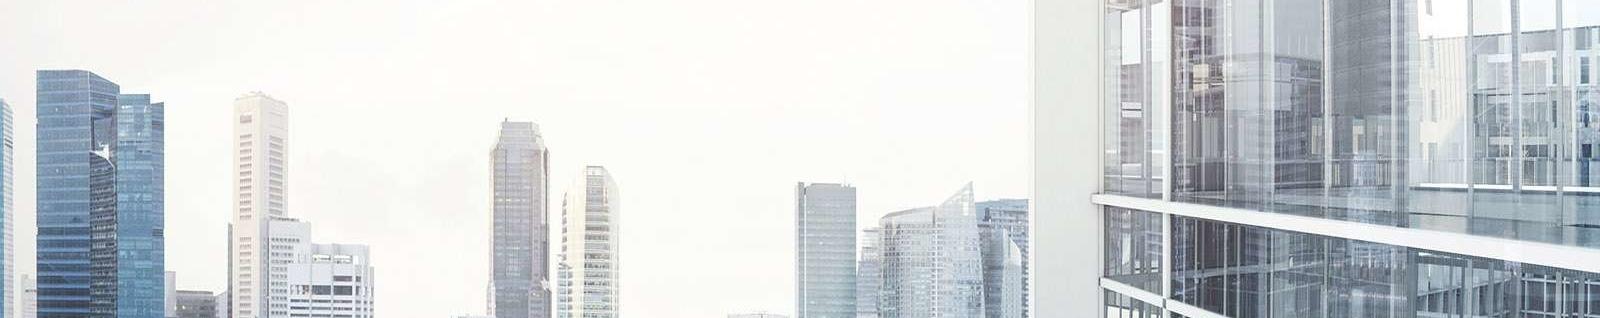 Corporate Design Werbeagentur Rosenheim